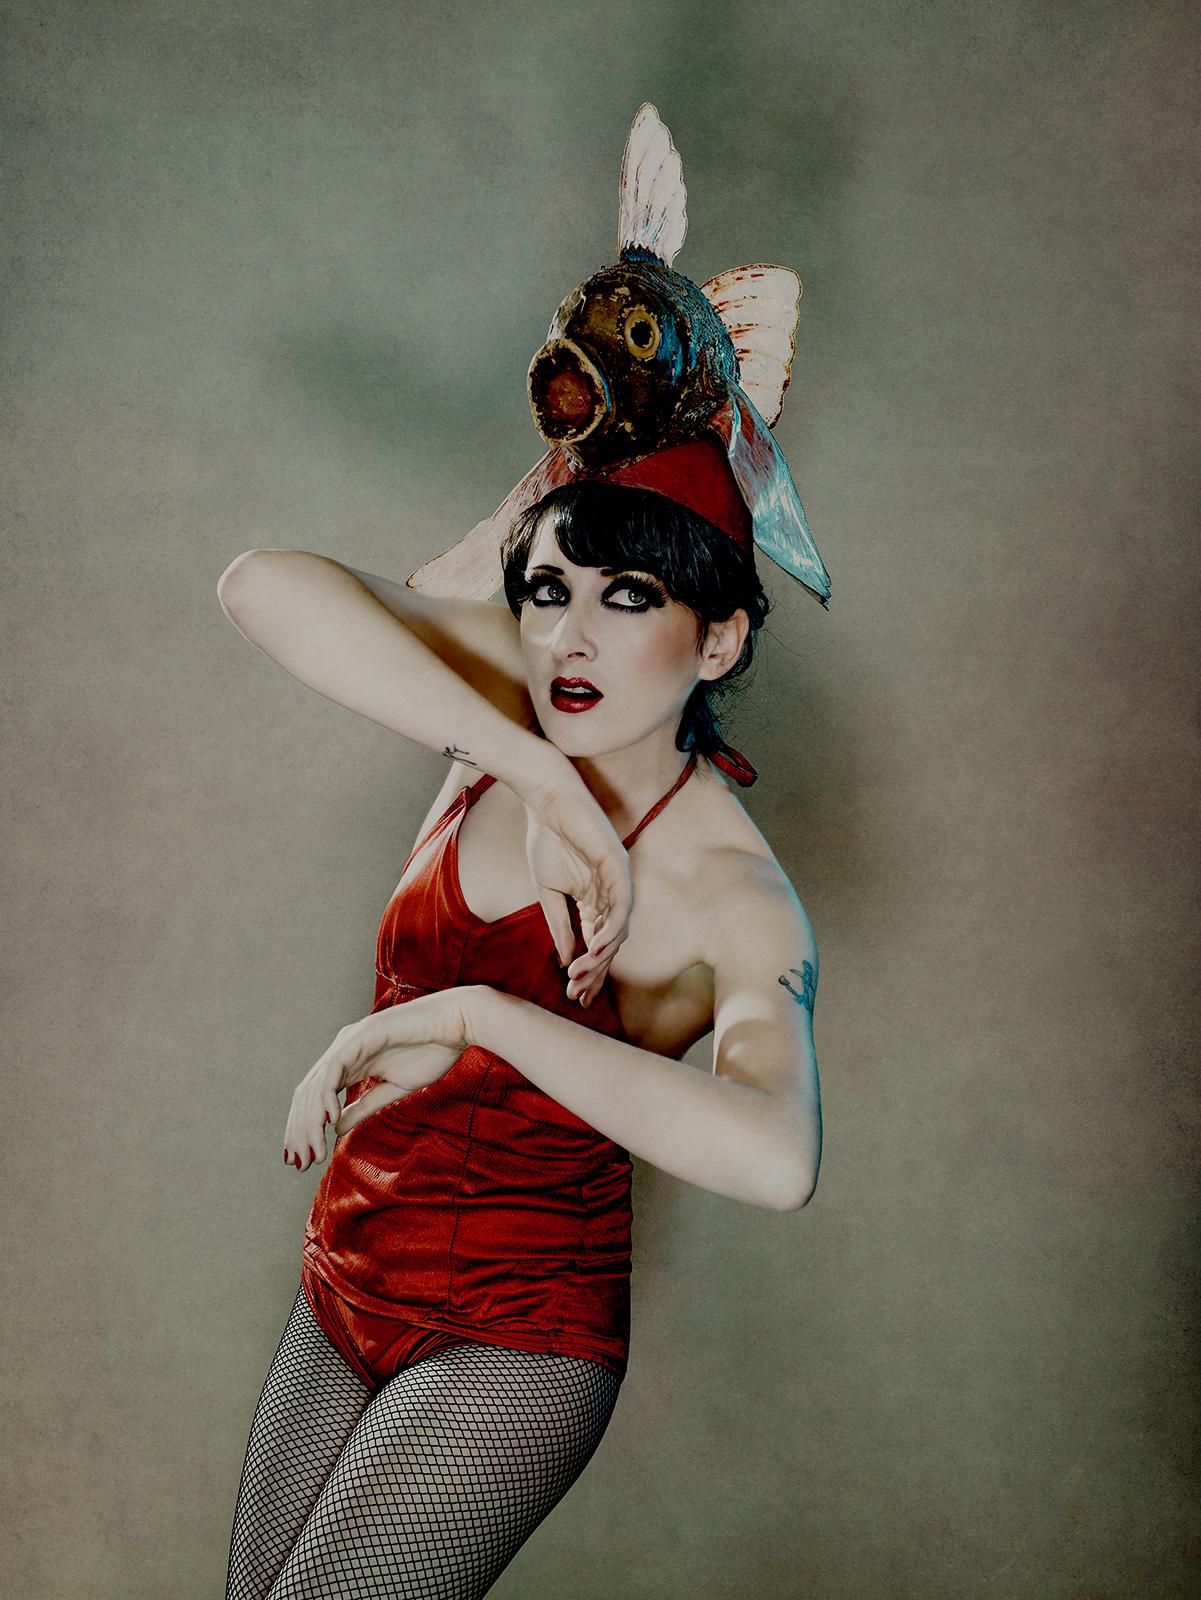 Weirdo mag. Magazine, Photographers BILLY & HELLS